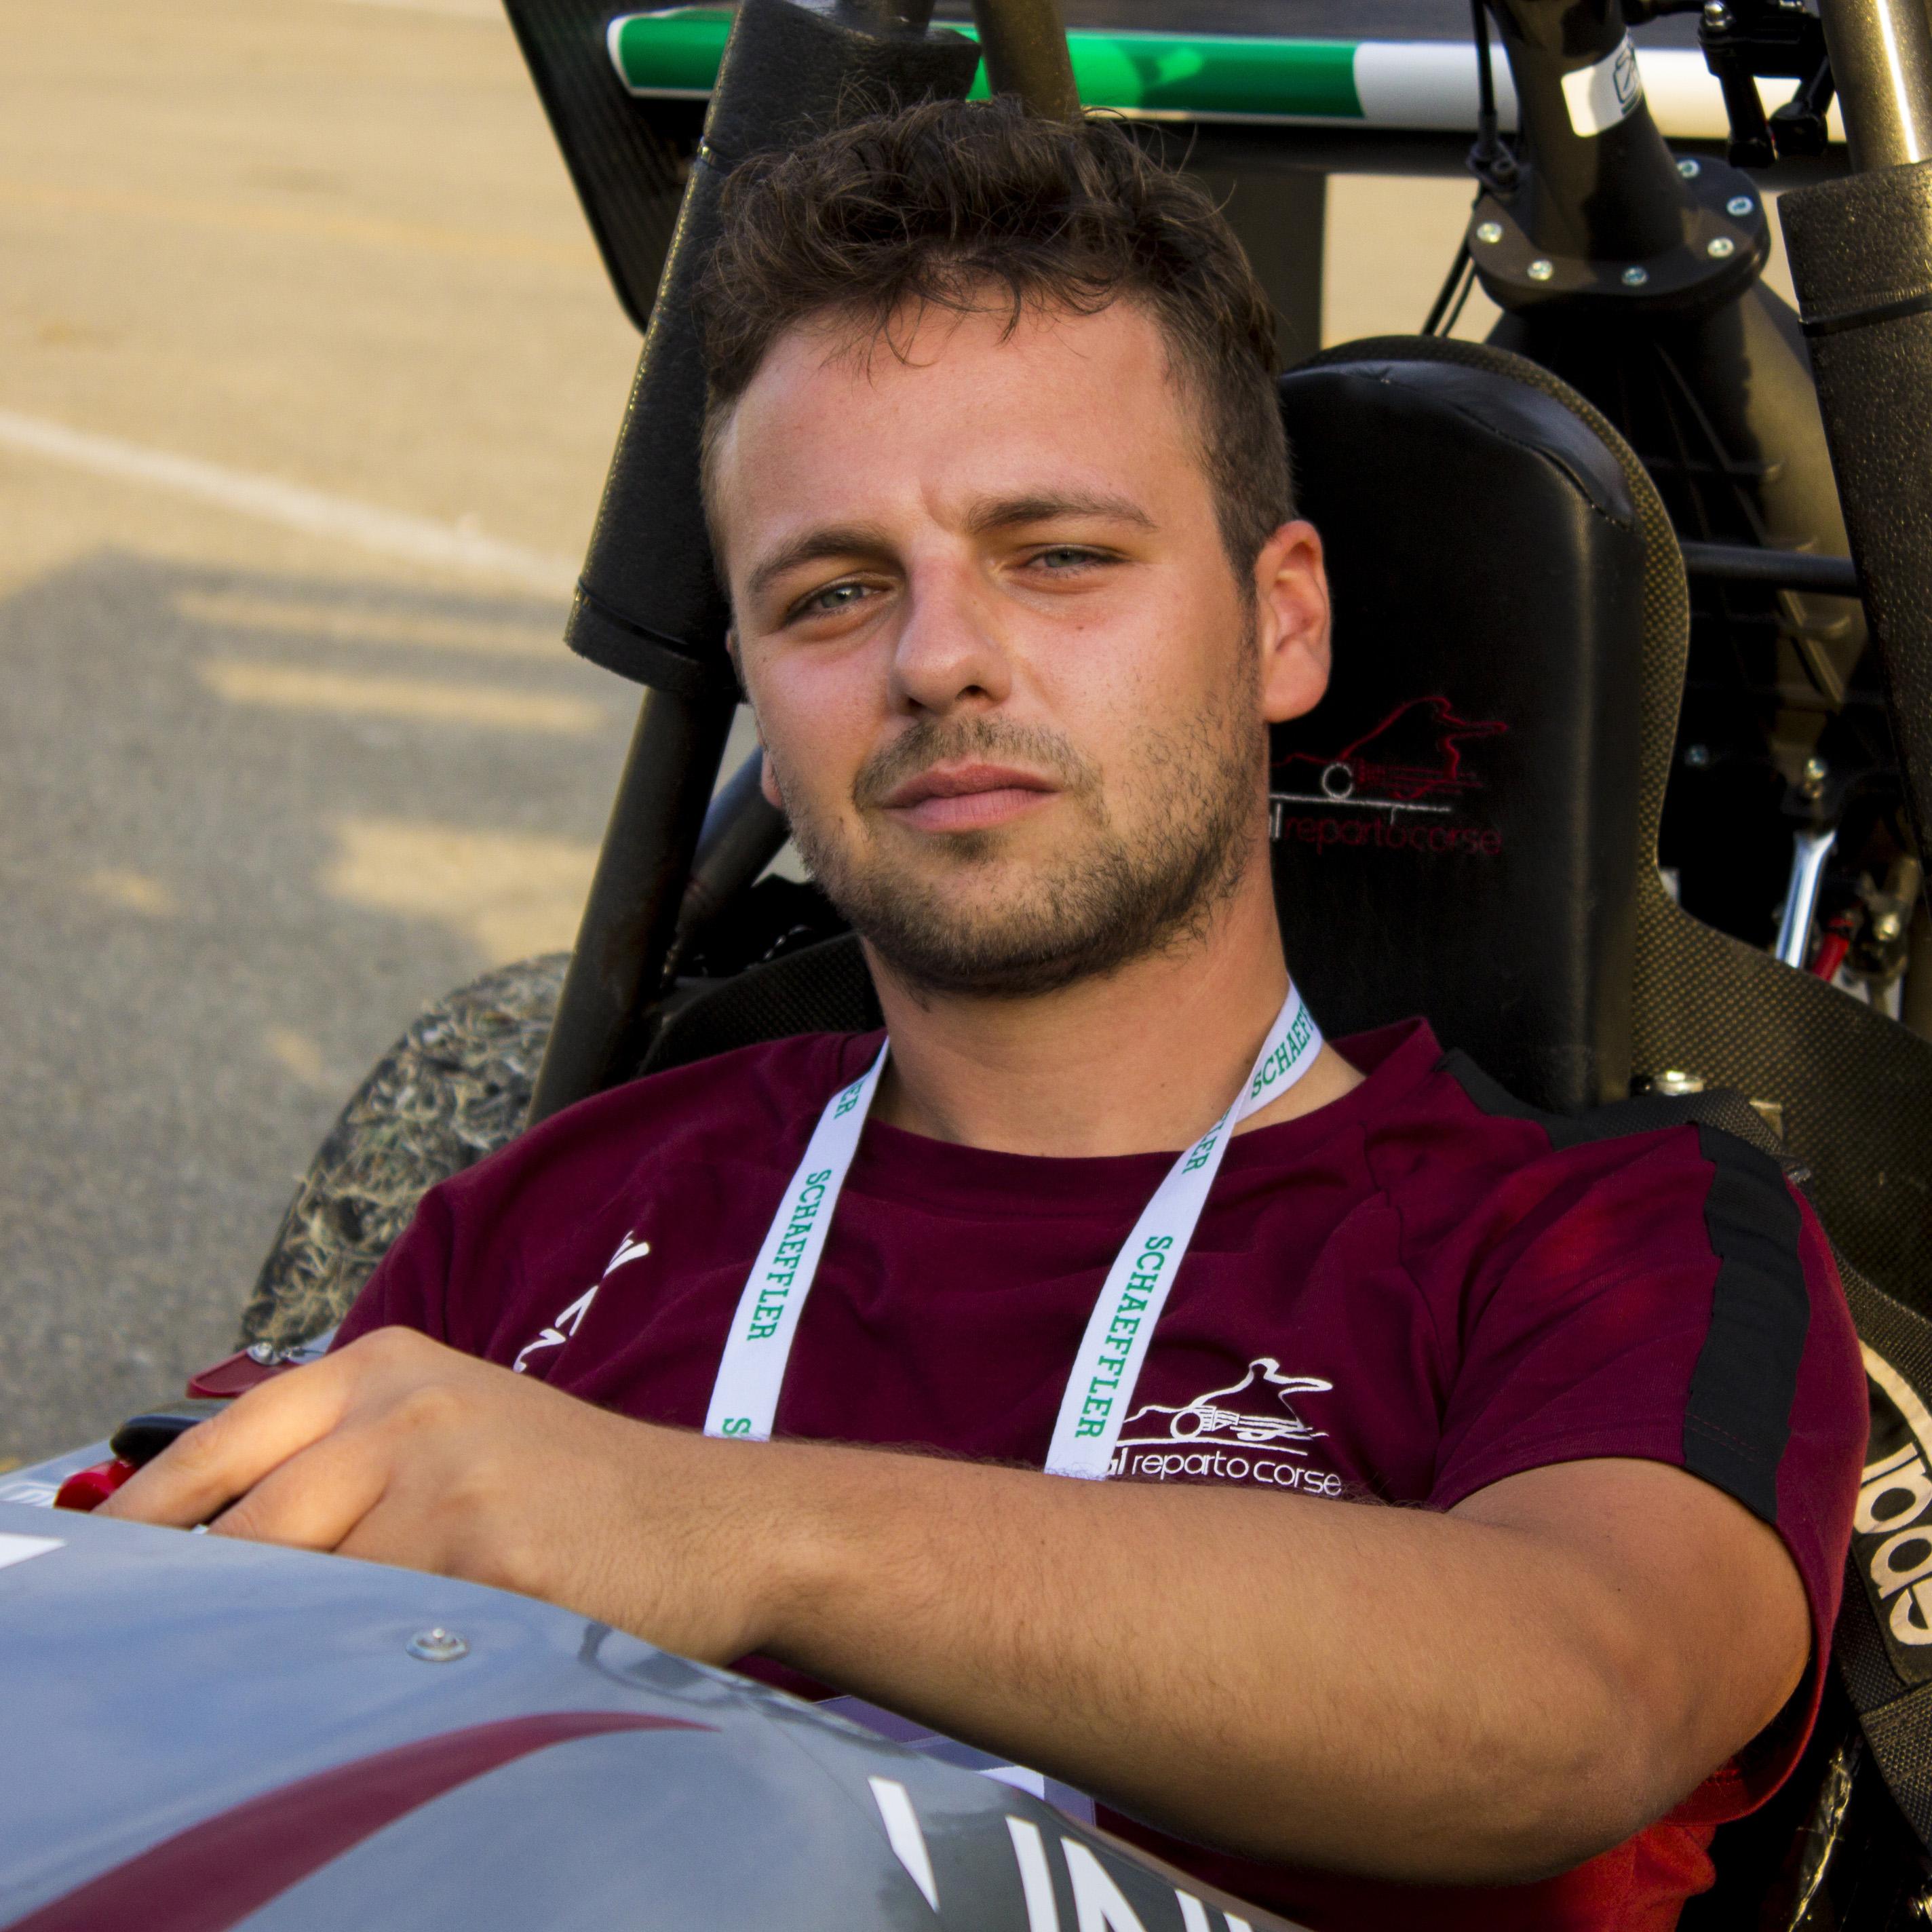 Matteo Bava